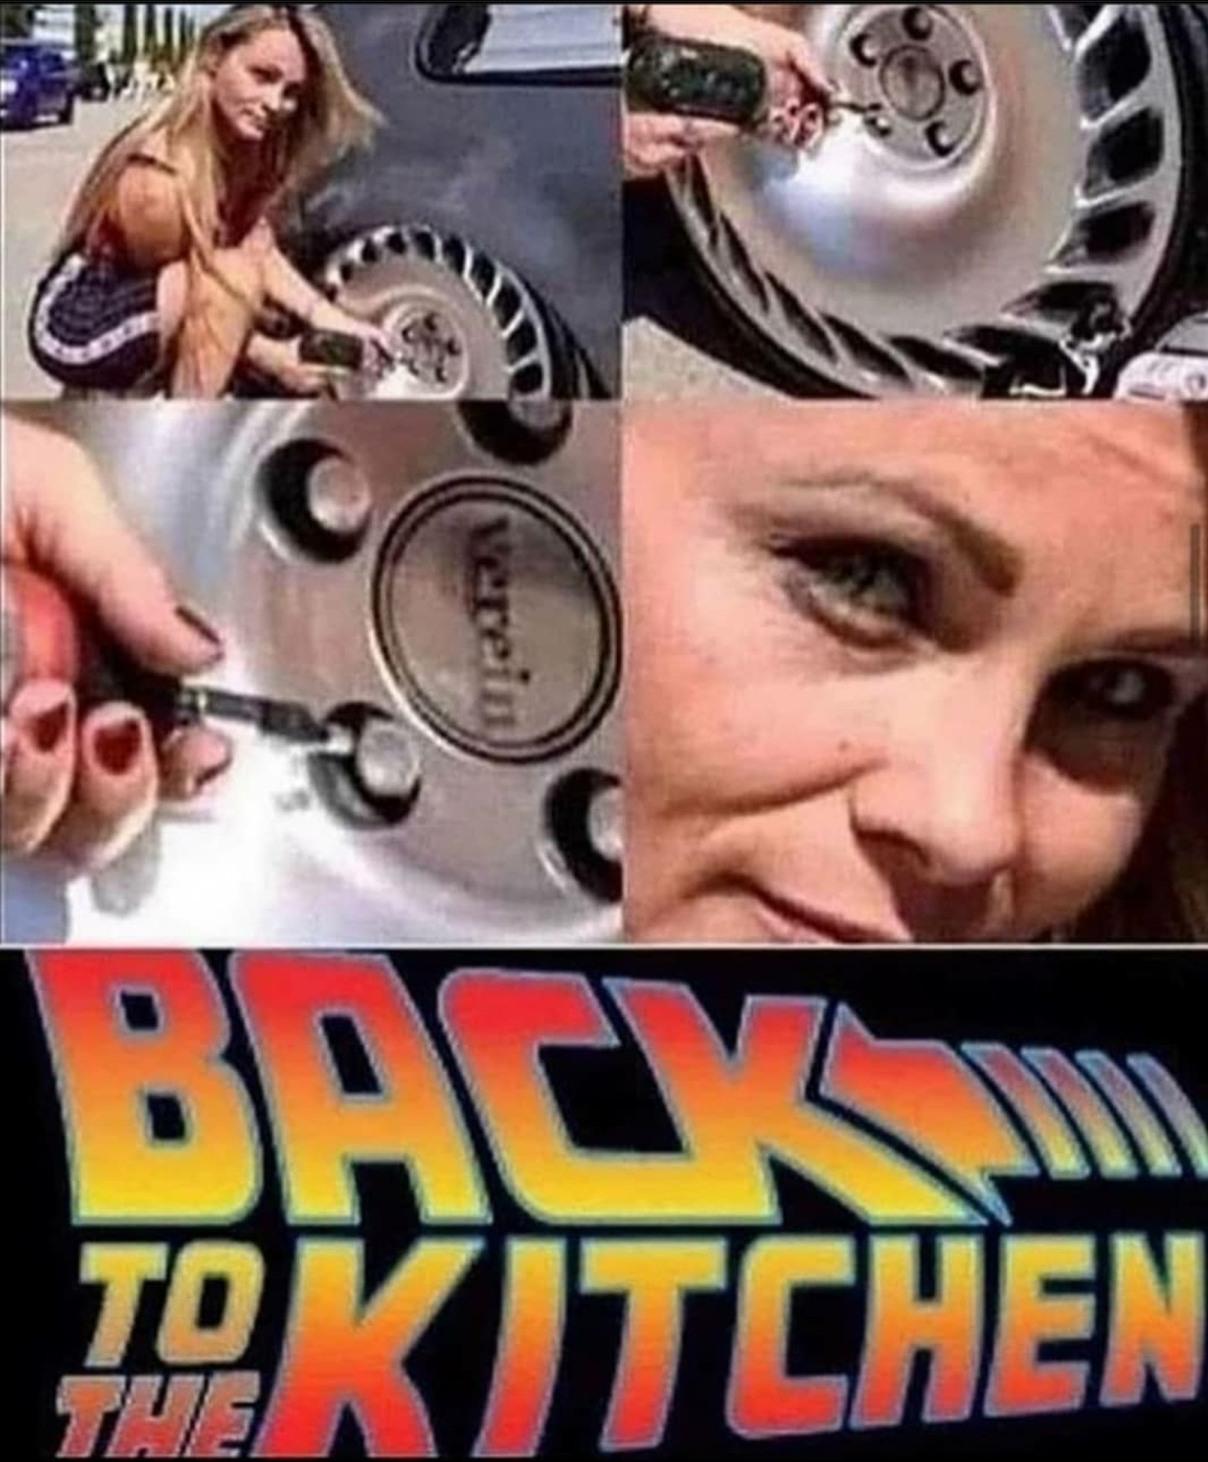 Back to theee kitcheeeen - meme